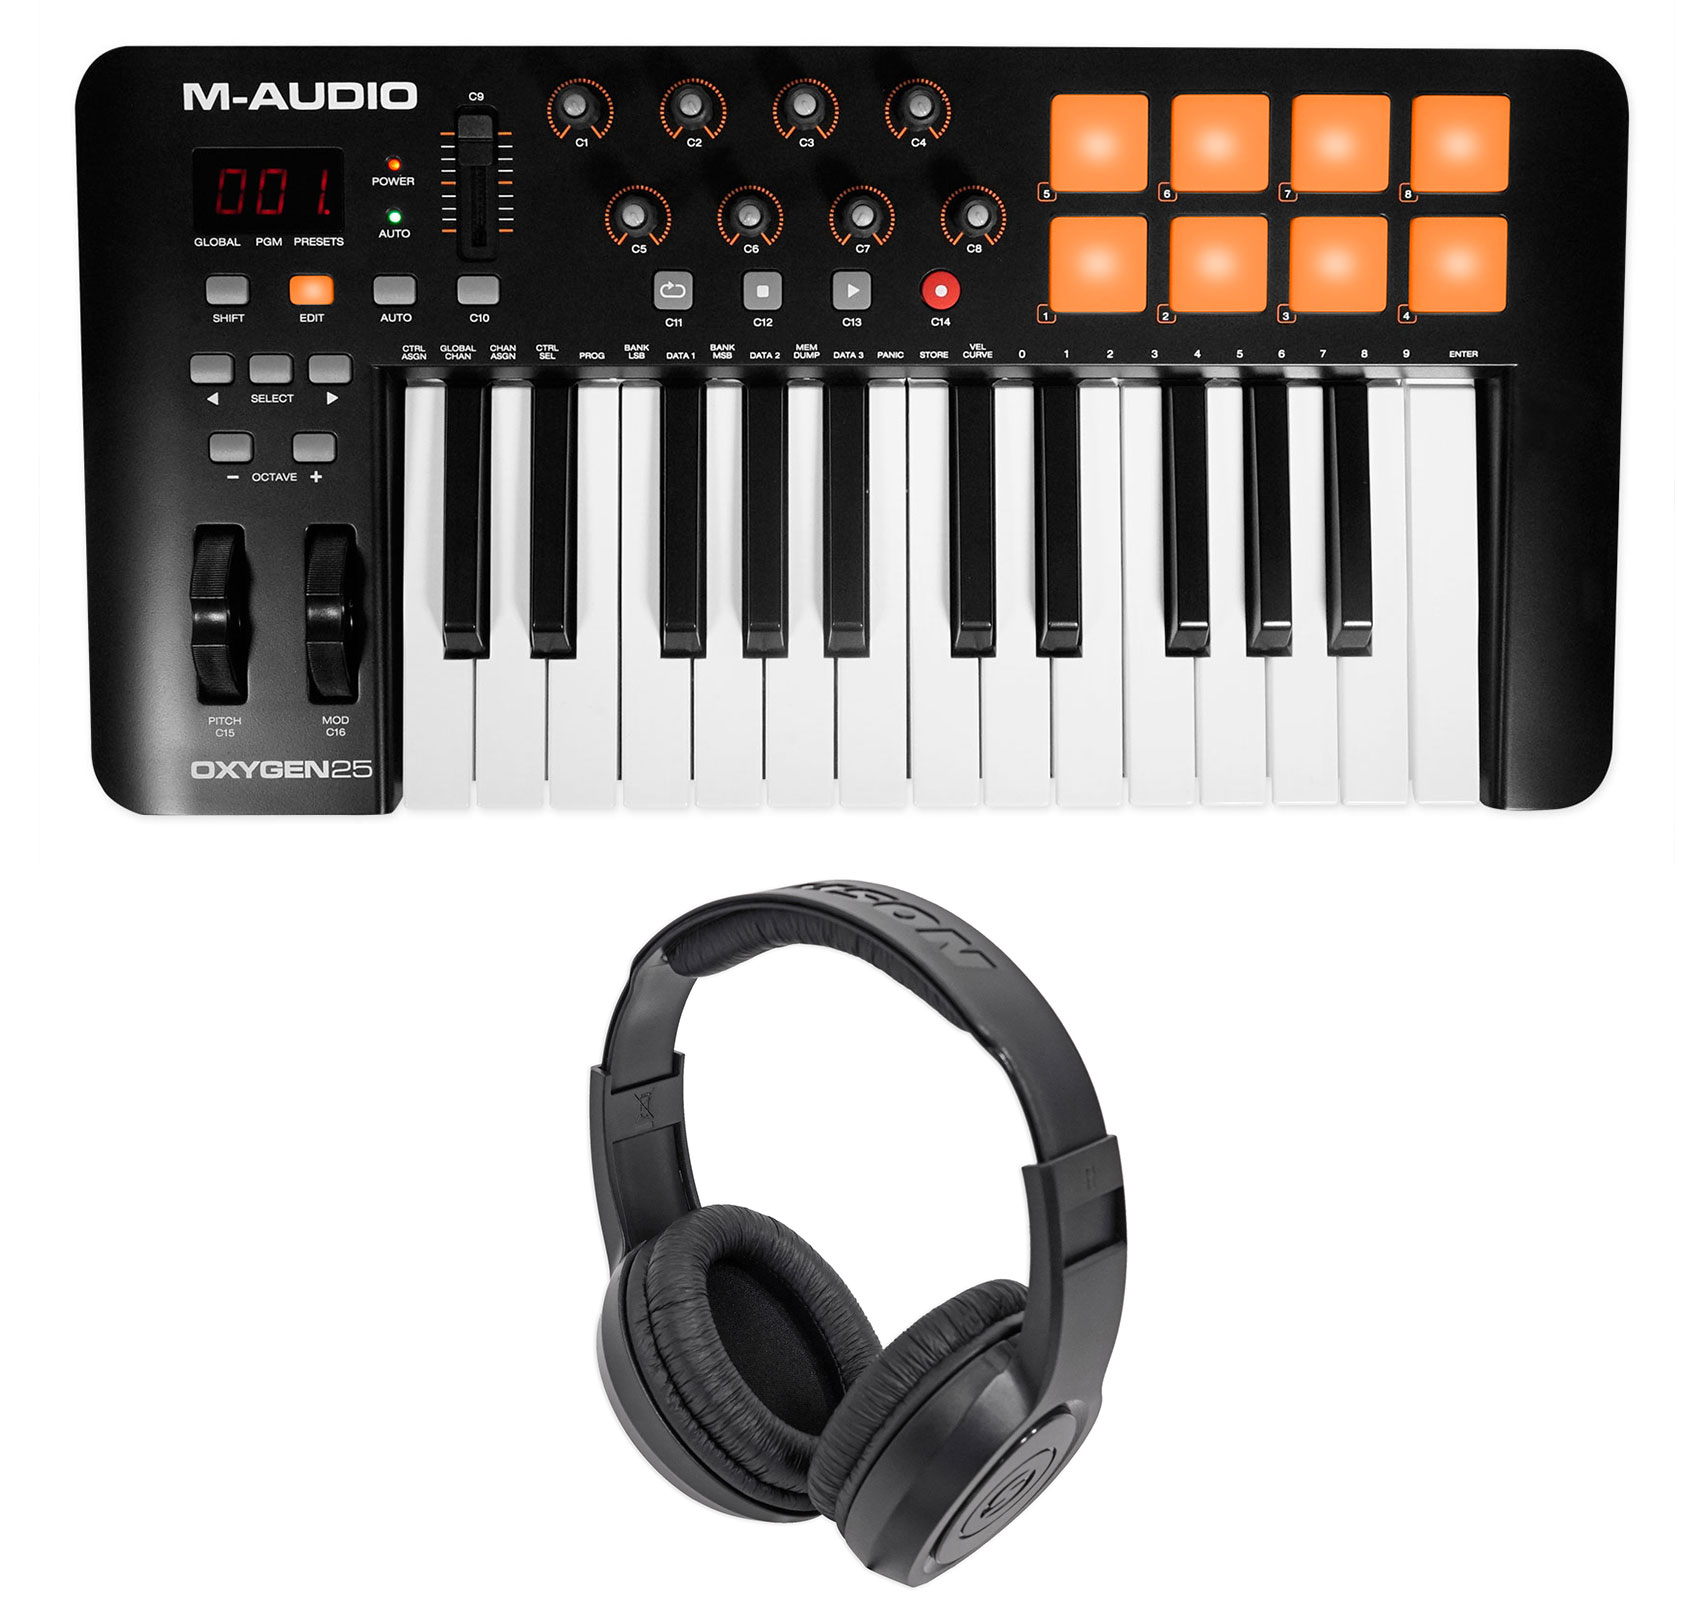 M-Audio Oxygen 25 MK IV 25-Key USB MIDI Keyboard Controller MKIV MK4+Headphones